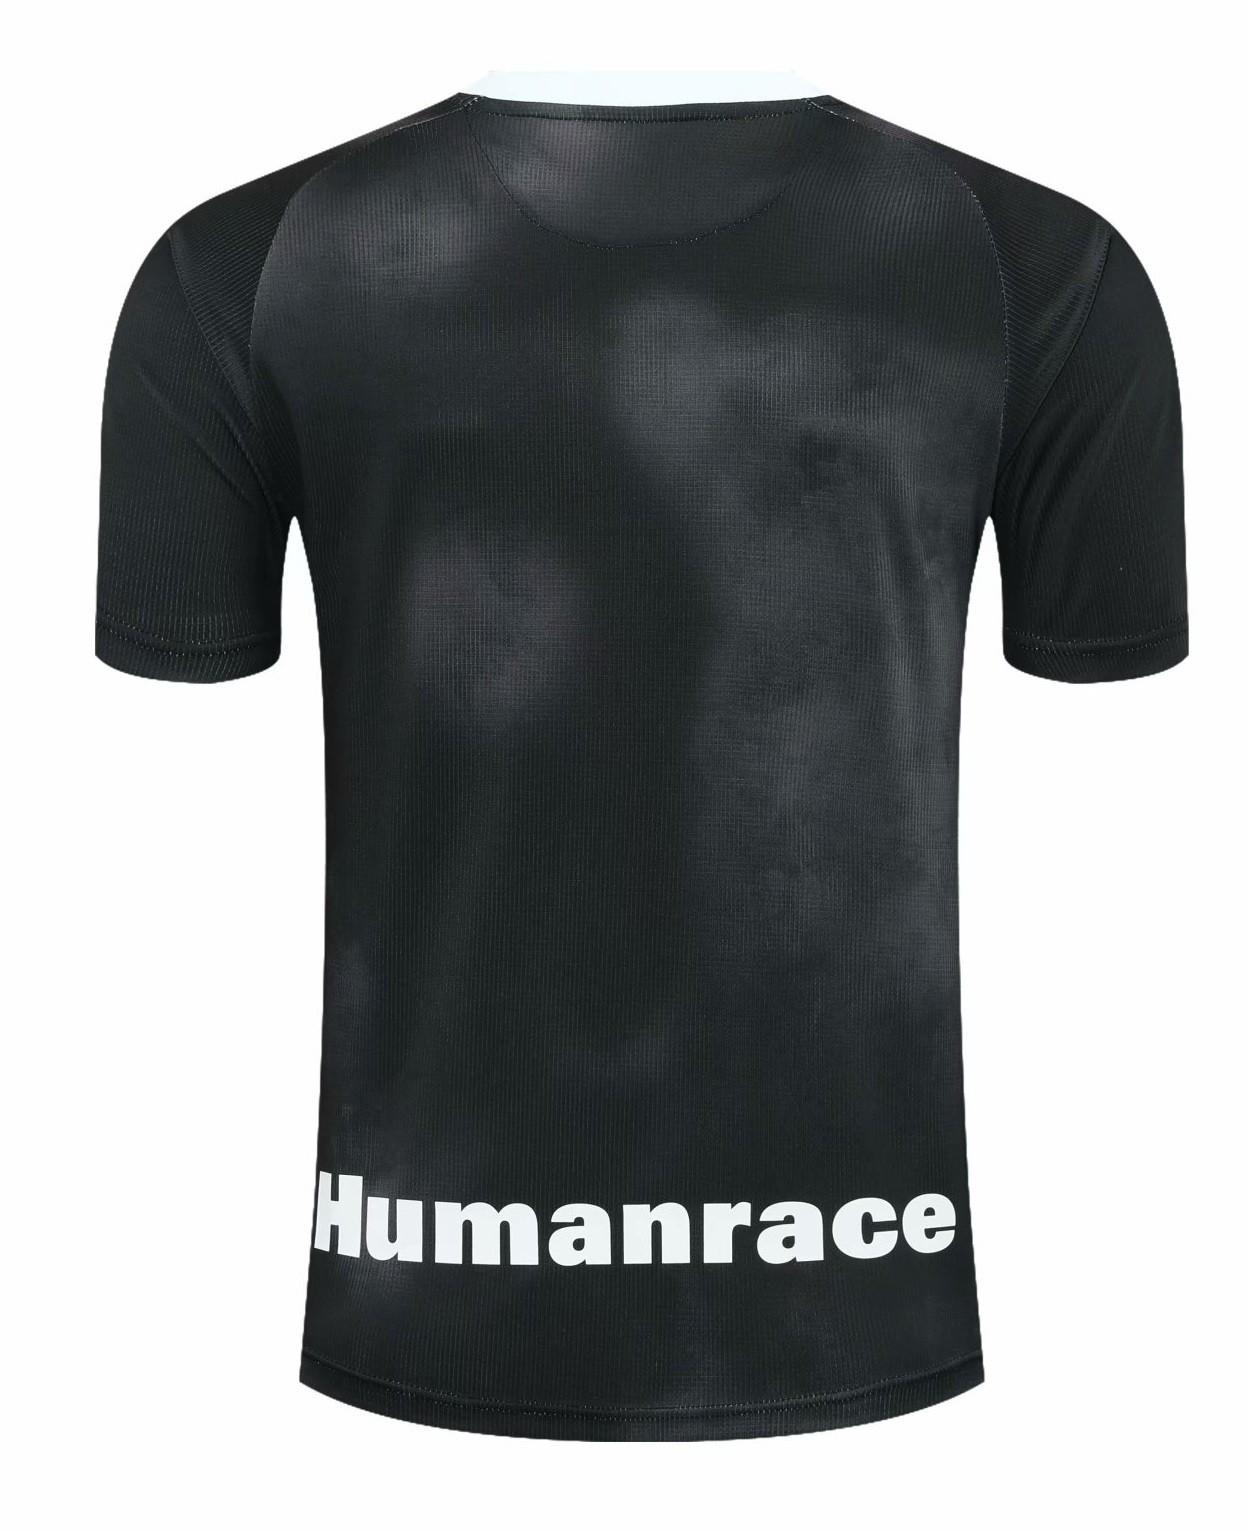 CAMISA REAL MADRID HUMAN RACE, EDIÇÃO LIMITADA 2021